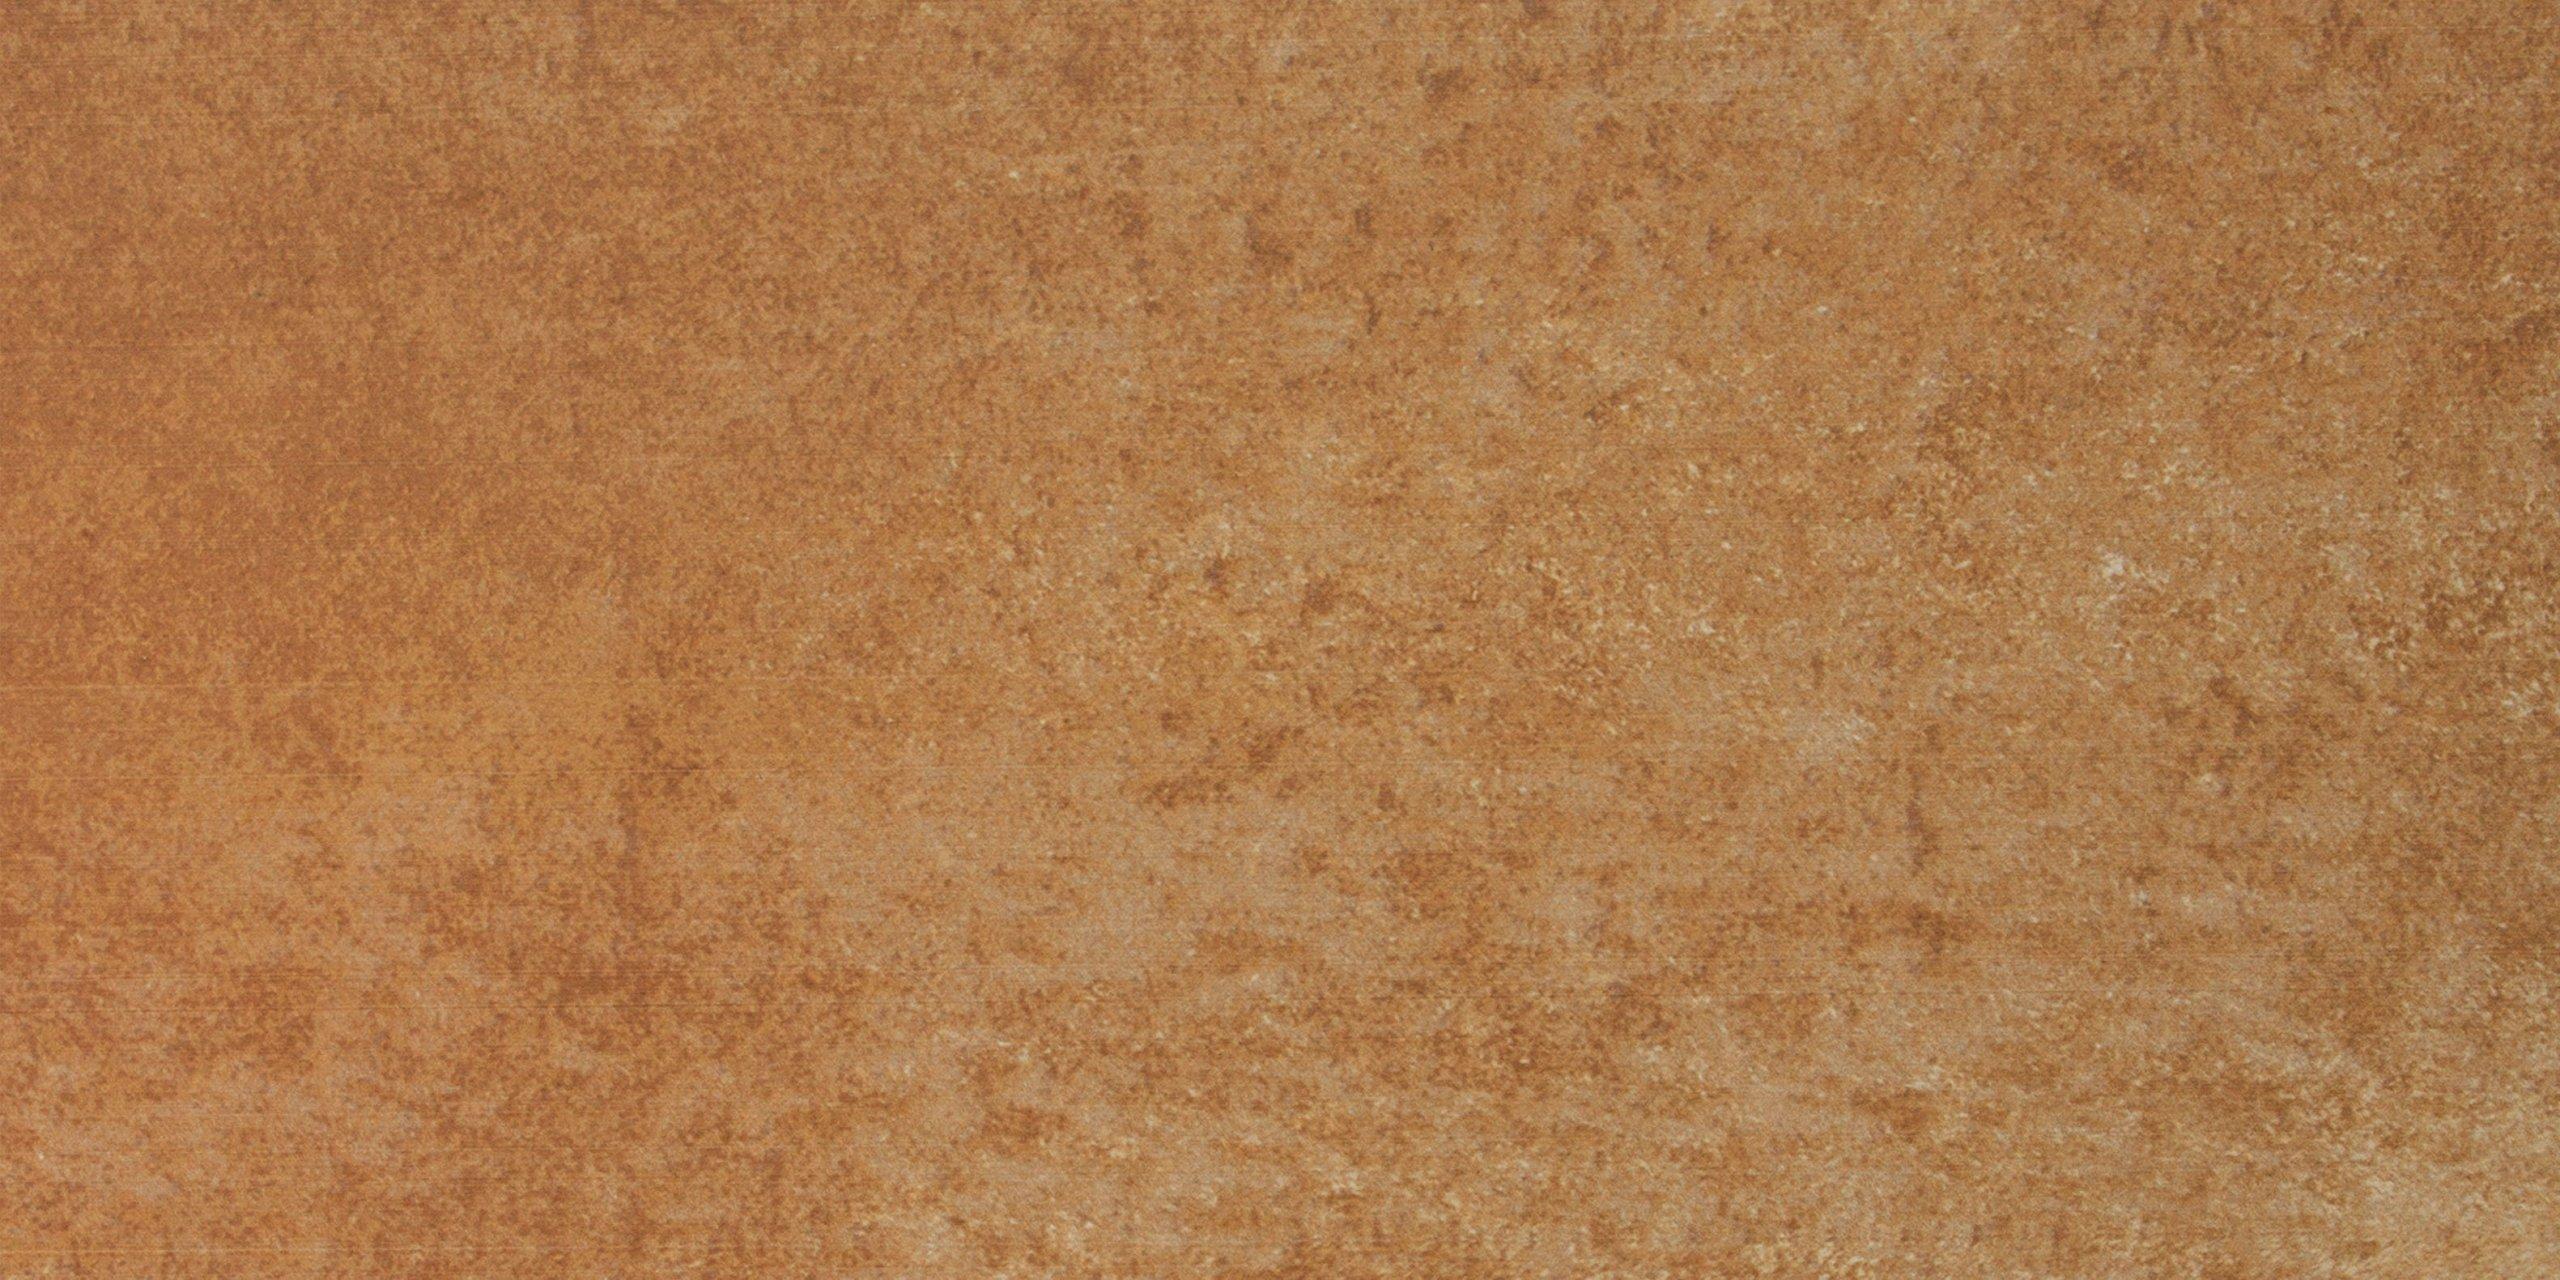 Fiandre USA TNS07M124 Contemporary 12'' x 24'' New Stone Ginger Stone Honed Porcelain Tile (8 Pack), Brown